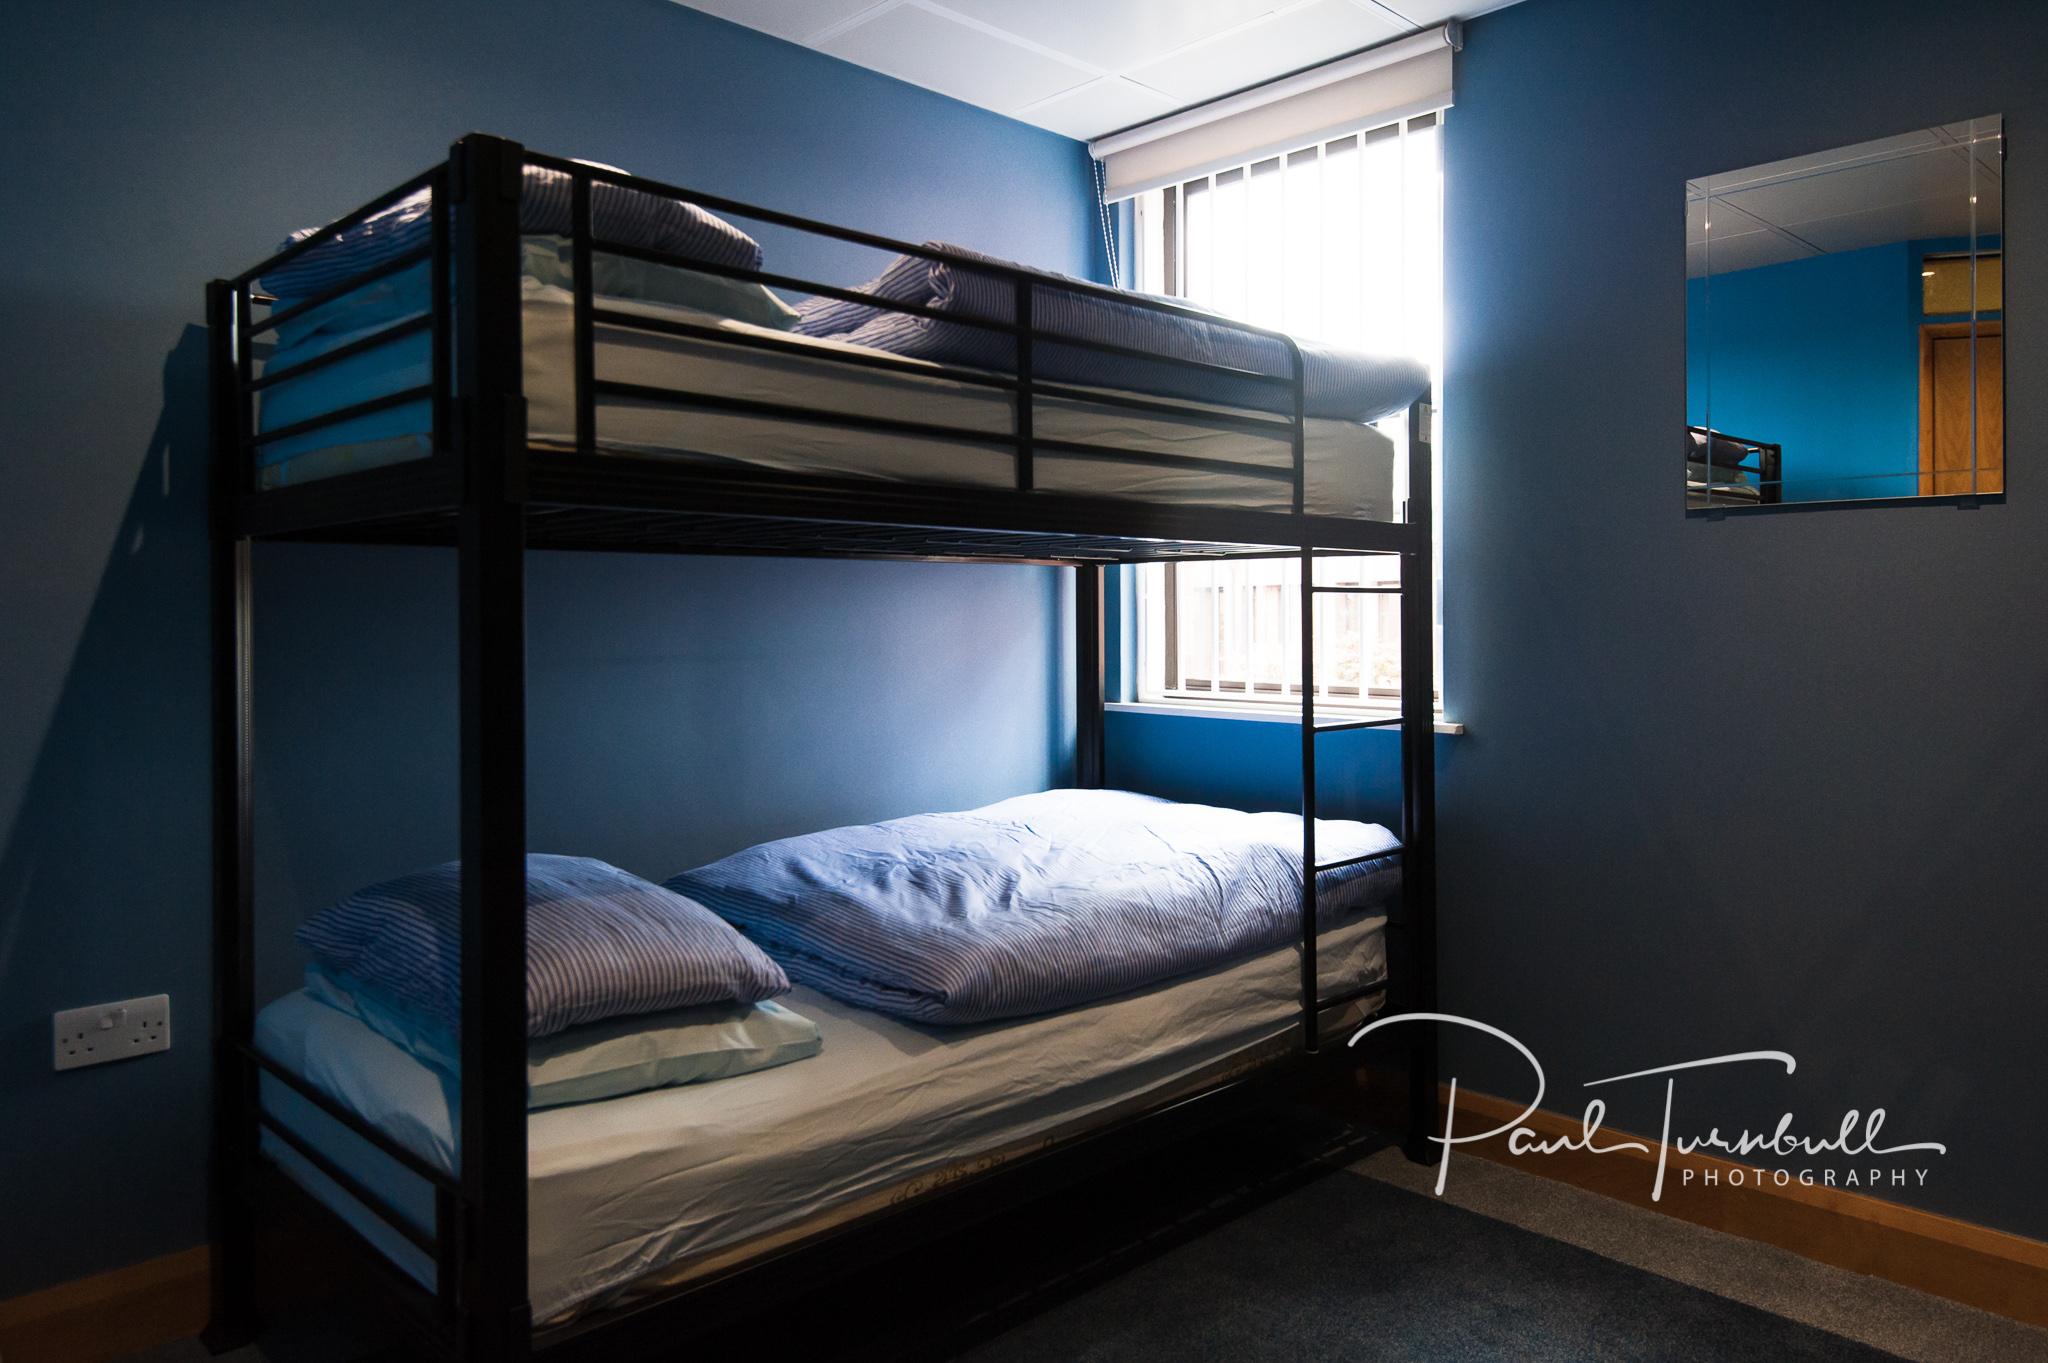 commercial-property-photographer-leeds-yorkshire-rs-hostels-005.jpg